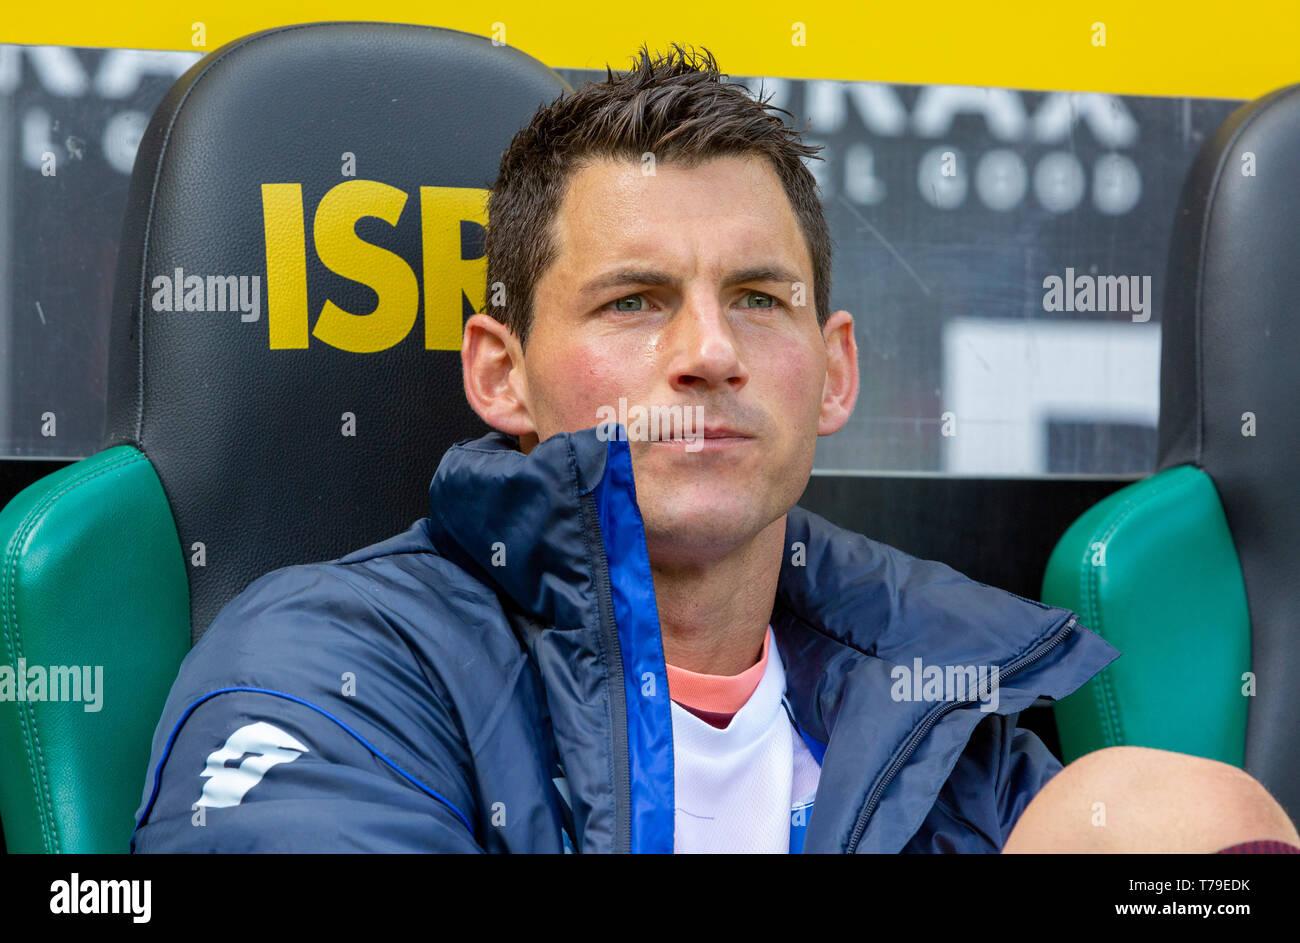 sports, football, Bundesliga, 2018/2019, Borussia Moenchengladbach vs. TSG 1899 Hoffenheim 2-2, Stadium Borussia Park, players bench, keeper Alexander Stolz (TSG), DFL REGULATIONS PROHIBIT ANY USE OF PHOTOGRAPHS AS IMAGE SEQUENCES AND/OR QUASI-VIDEO - Stock Image